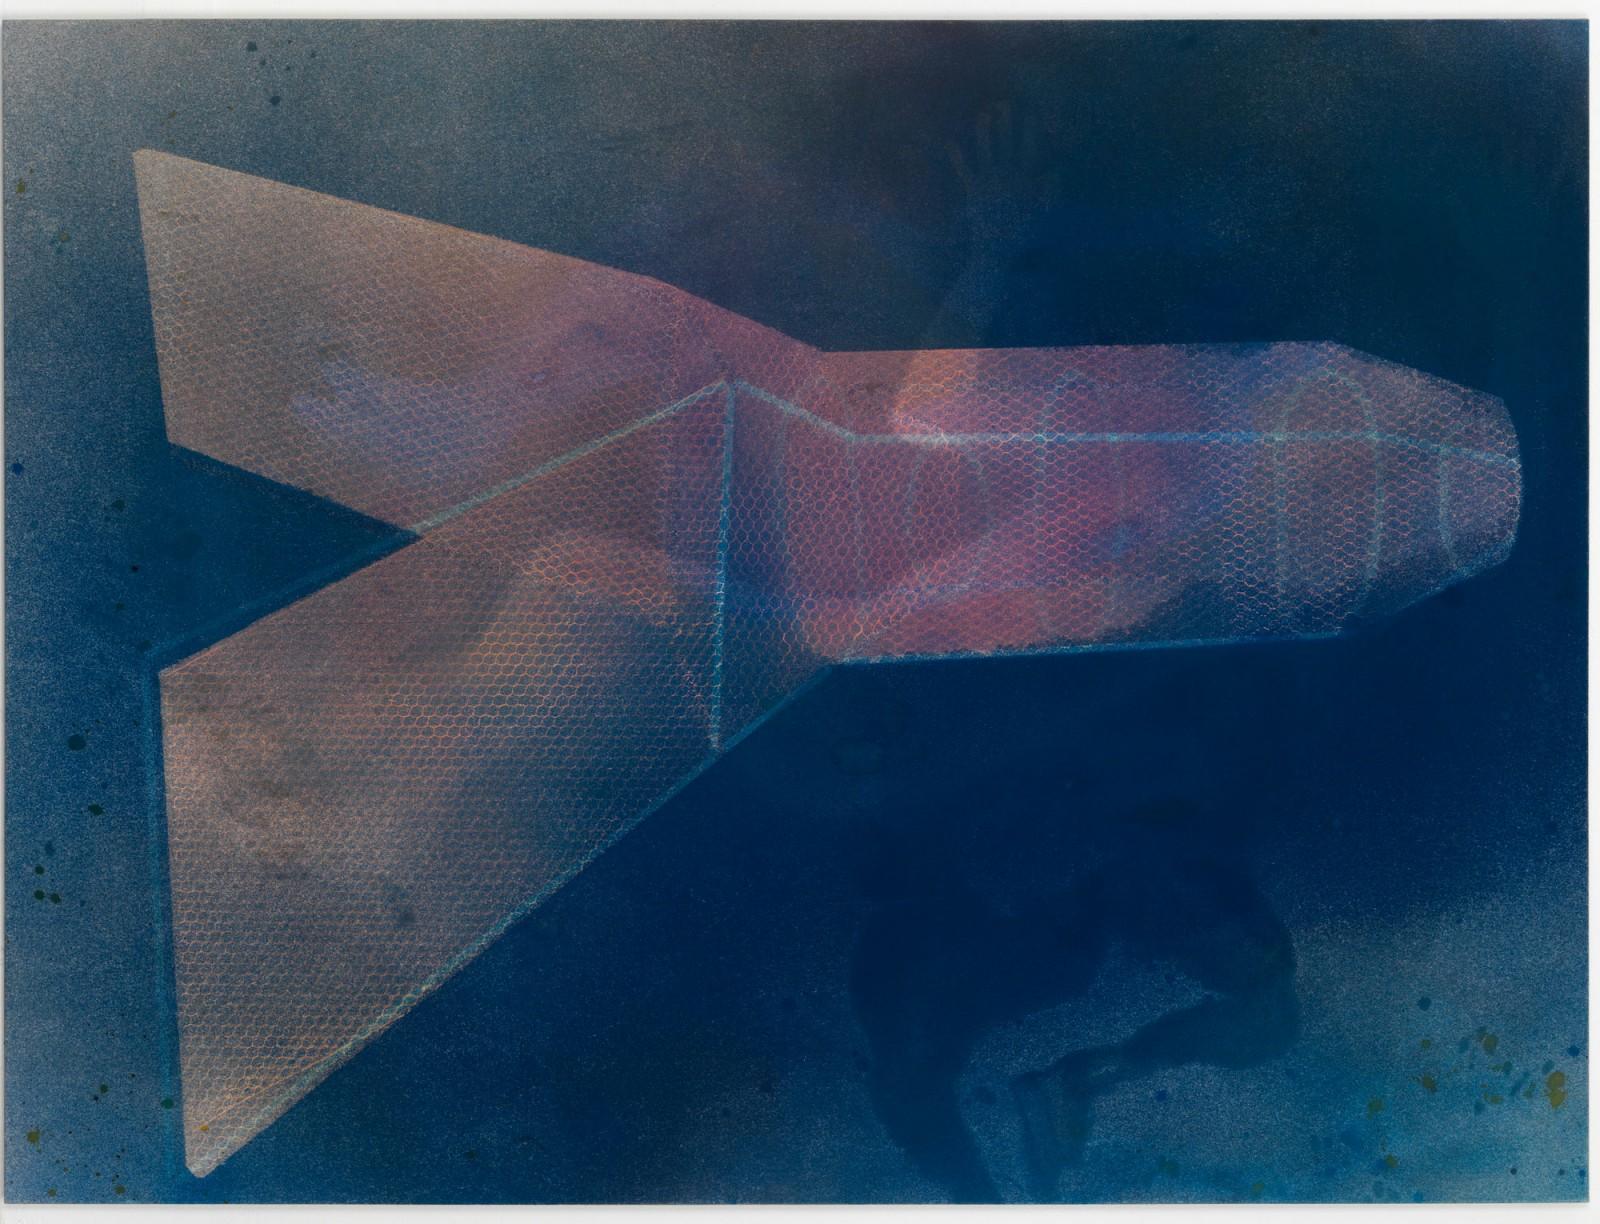 Kim Nekarda: Carcharodon Carcharias, 2010, vinyl color & body print on cotton, 150 x 200 cm, private collection